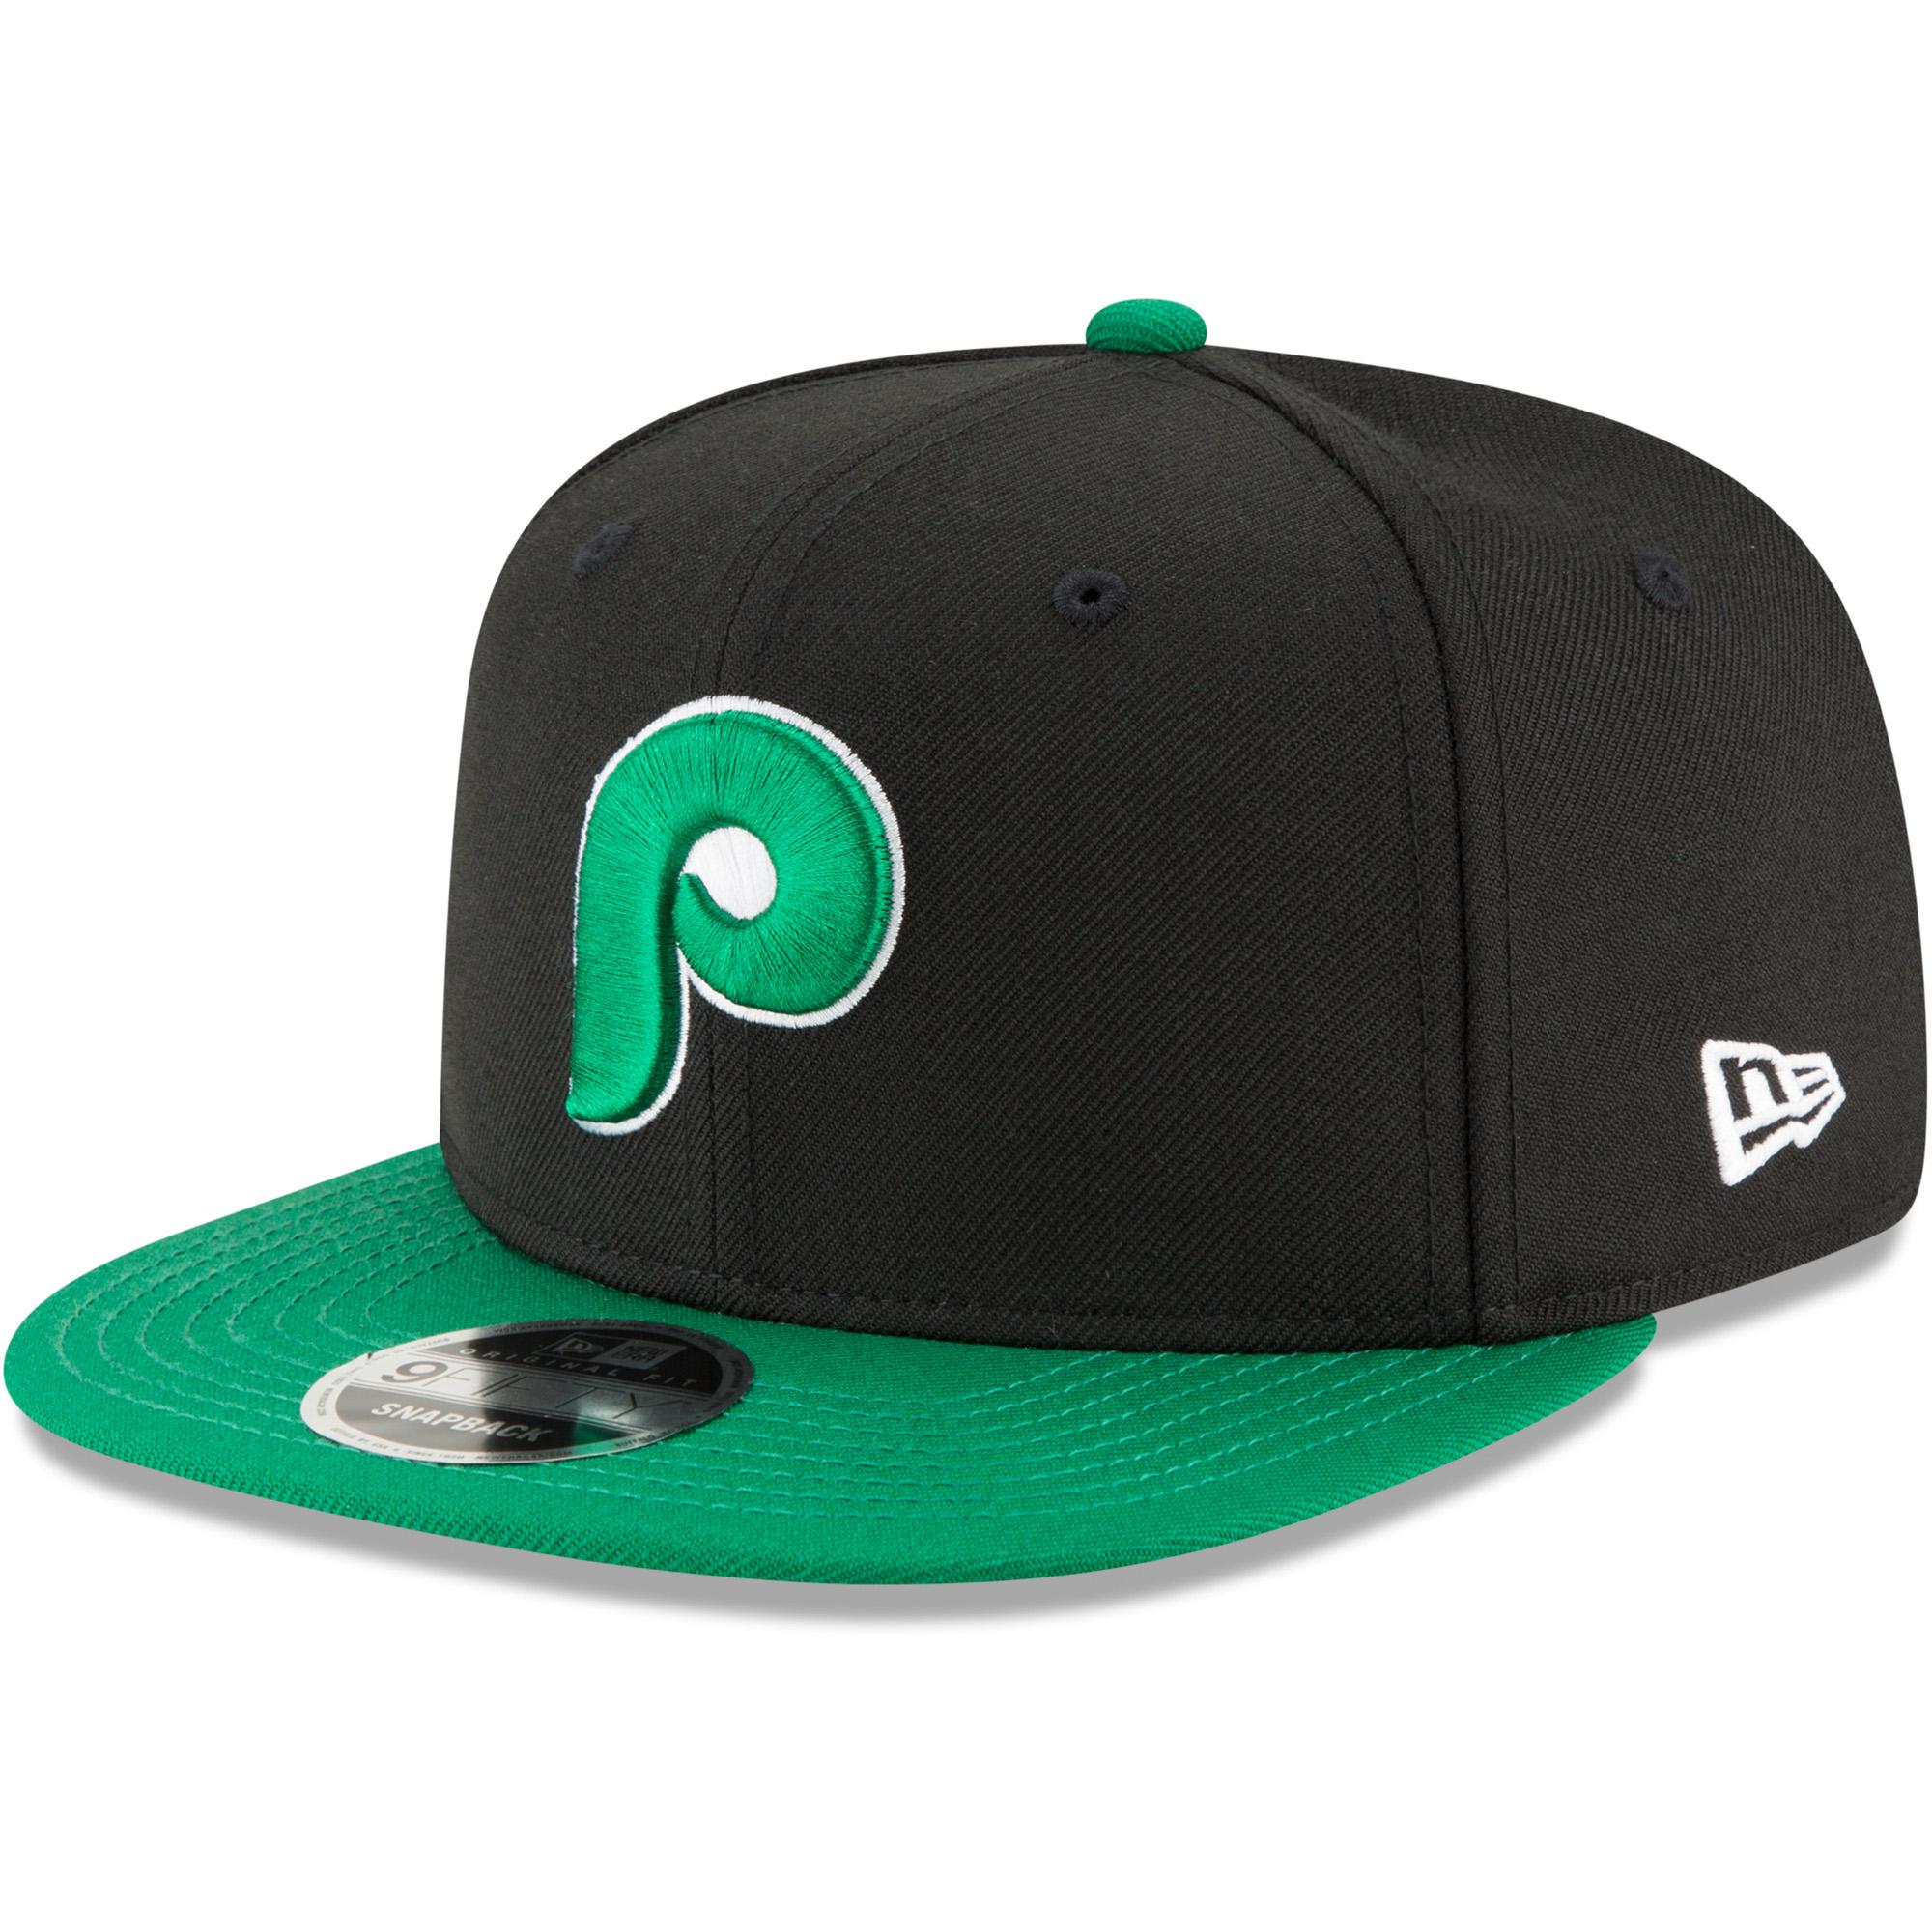 Philadelphia Phillies New Era Crossover 9FIFTY Snapback Adjustable Hat - Black/Kelly Green - OSFA